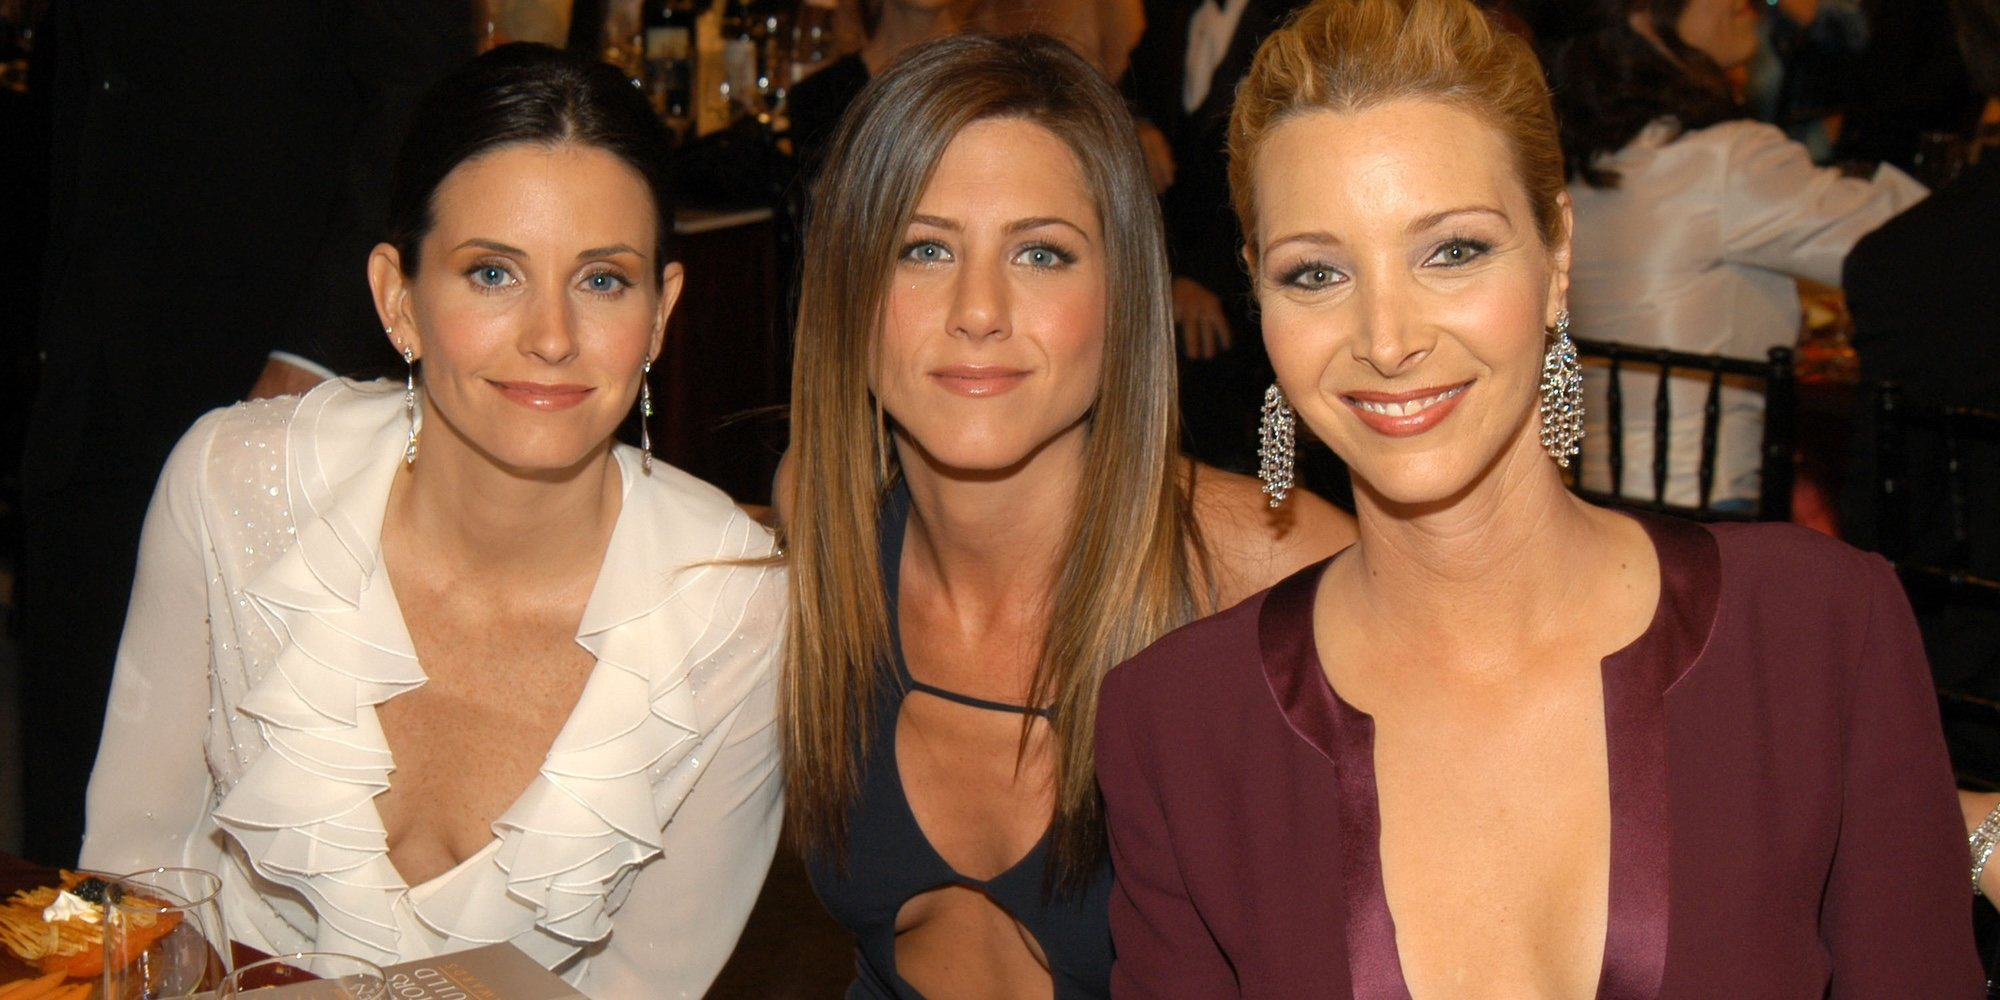 Courteney Cox celebra su 55 cumpleaños con sus 'Friends' Jennifer Aniston y Lisa Kudrow